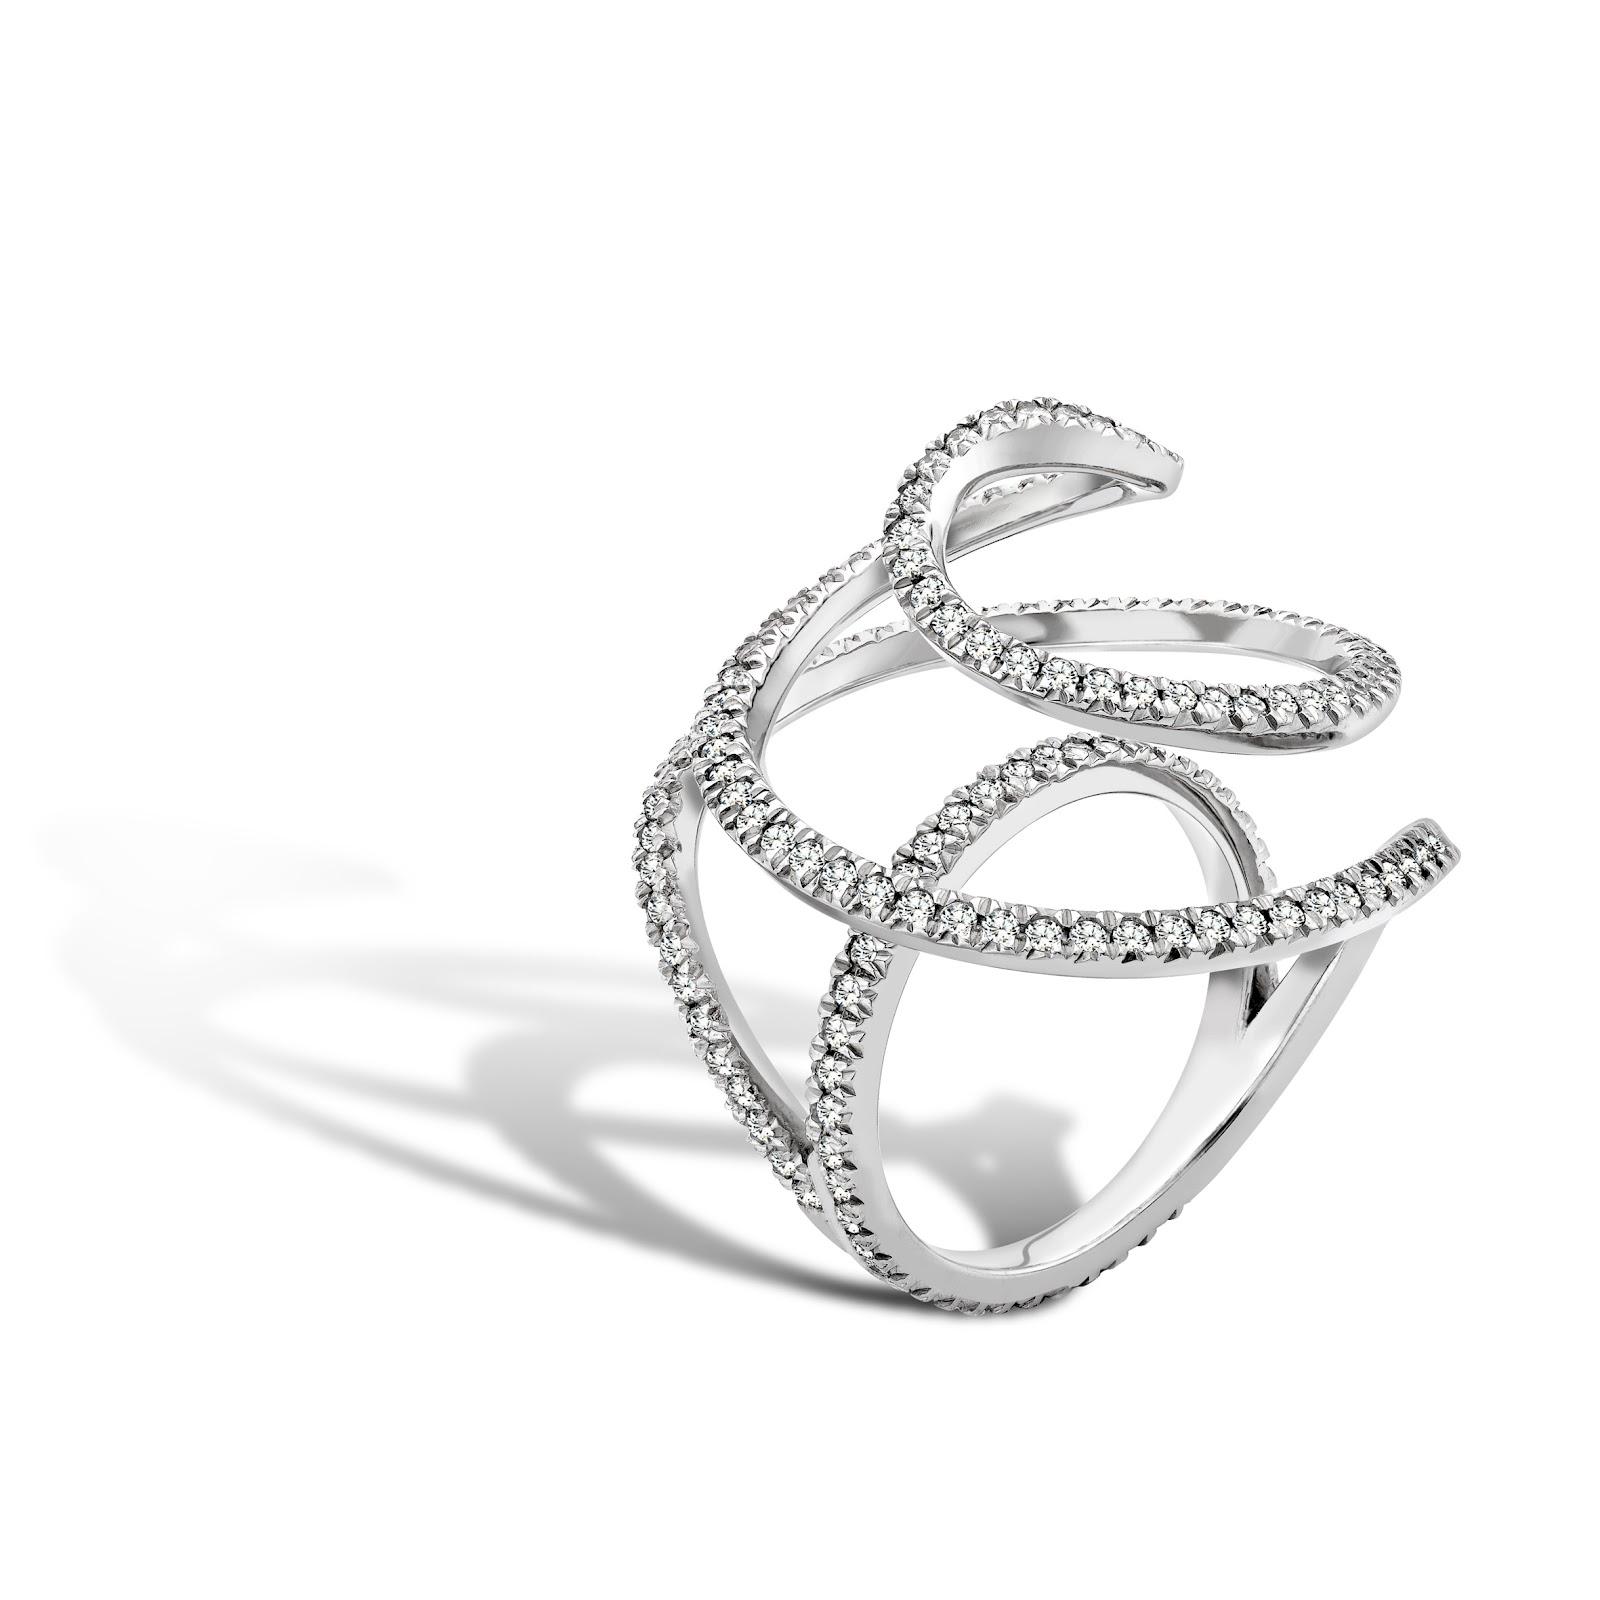 Zoe Harding Jewellery Design Innovation Award 2011